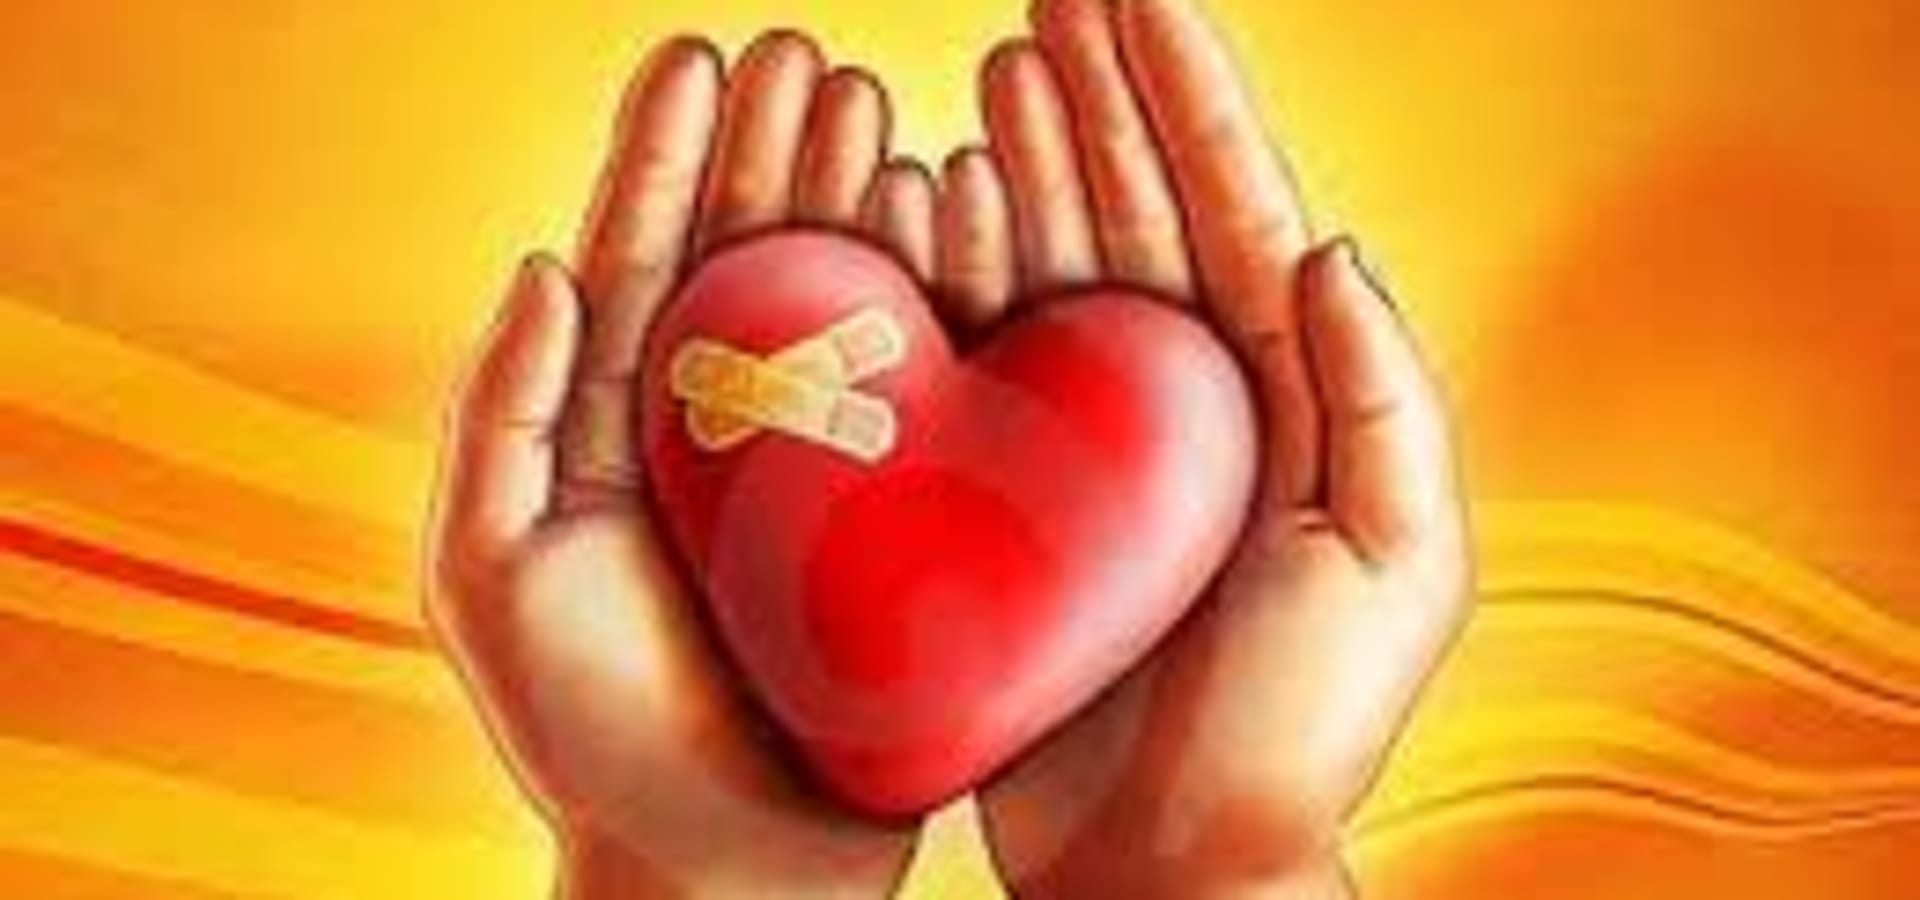 Prof Ali  love spells caster & a traditional healer +27785720910 in Adamayview , Boetrand , Collerville, De Clerqville ,  Doringkruin ,  Elandia , Elandsheuwel , Ellaton, Flimieda,  Flamwood